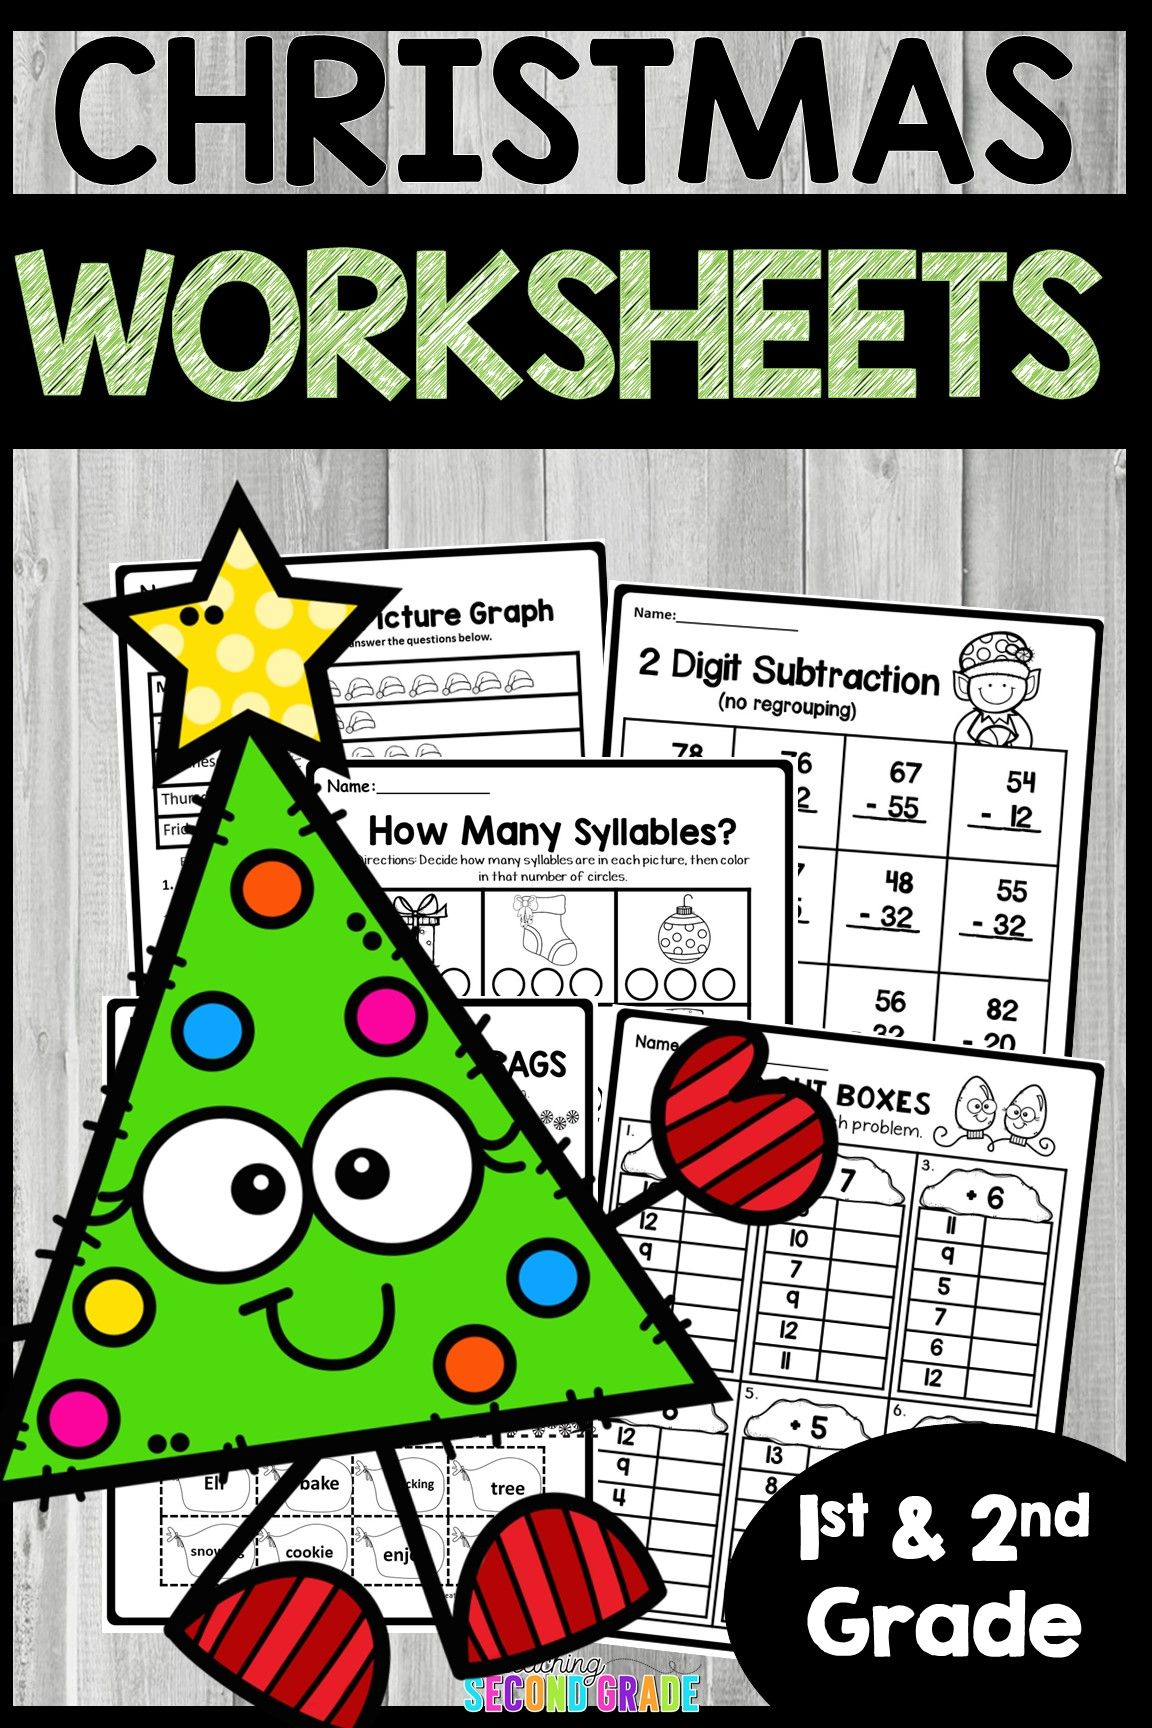 hight resolution of Christmas Worksheets   Christmas worksheets